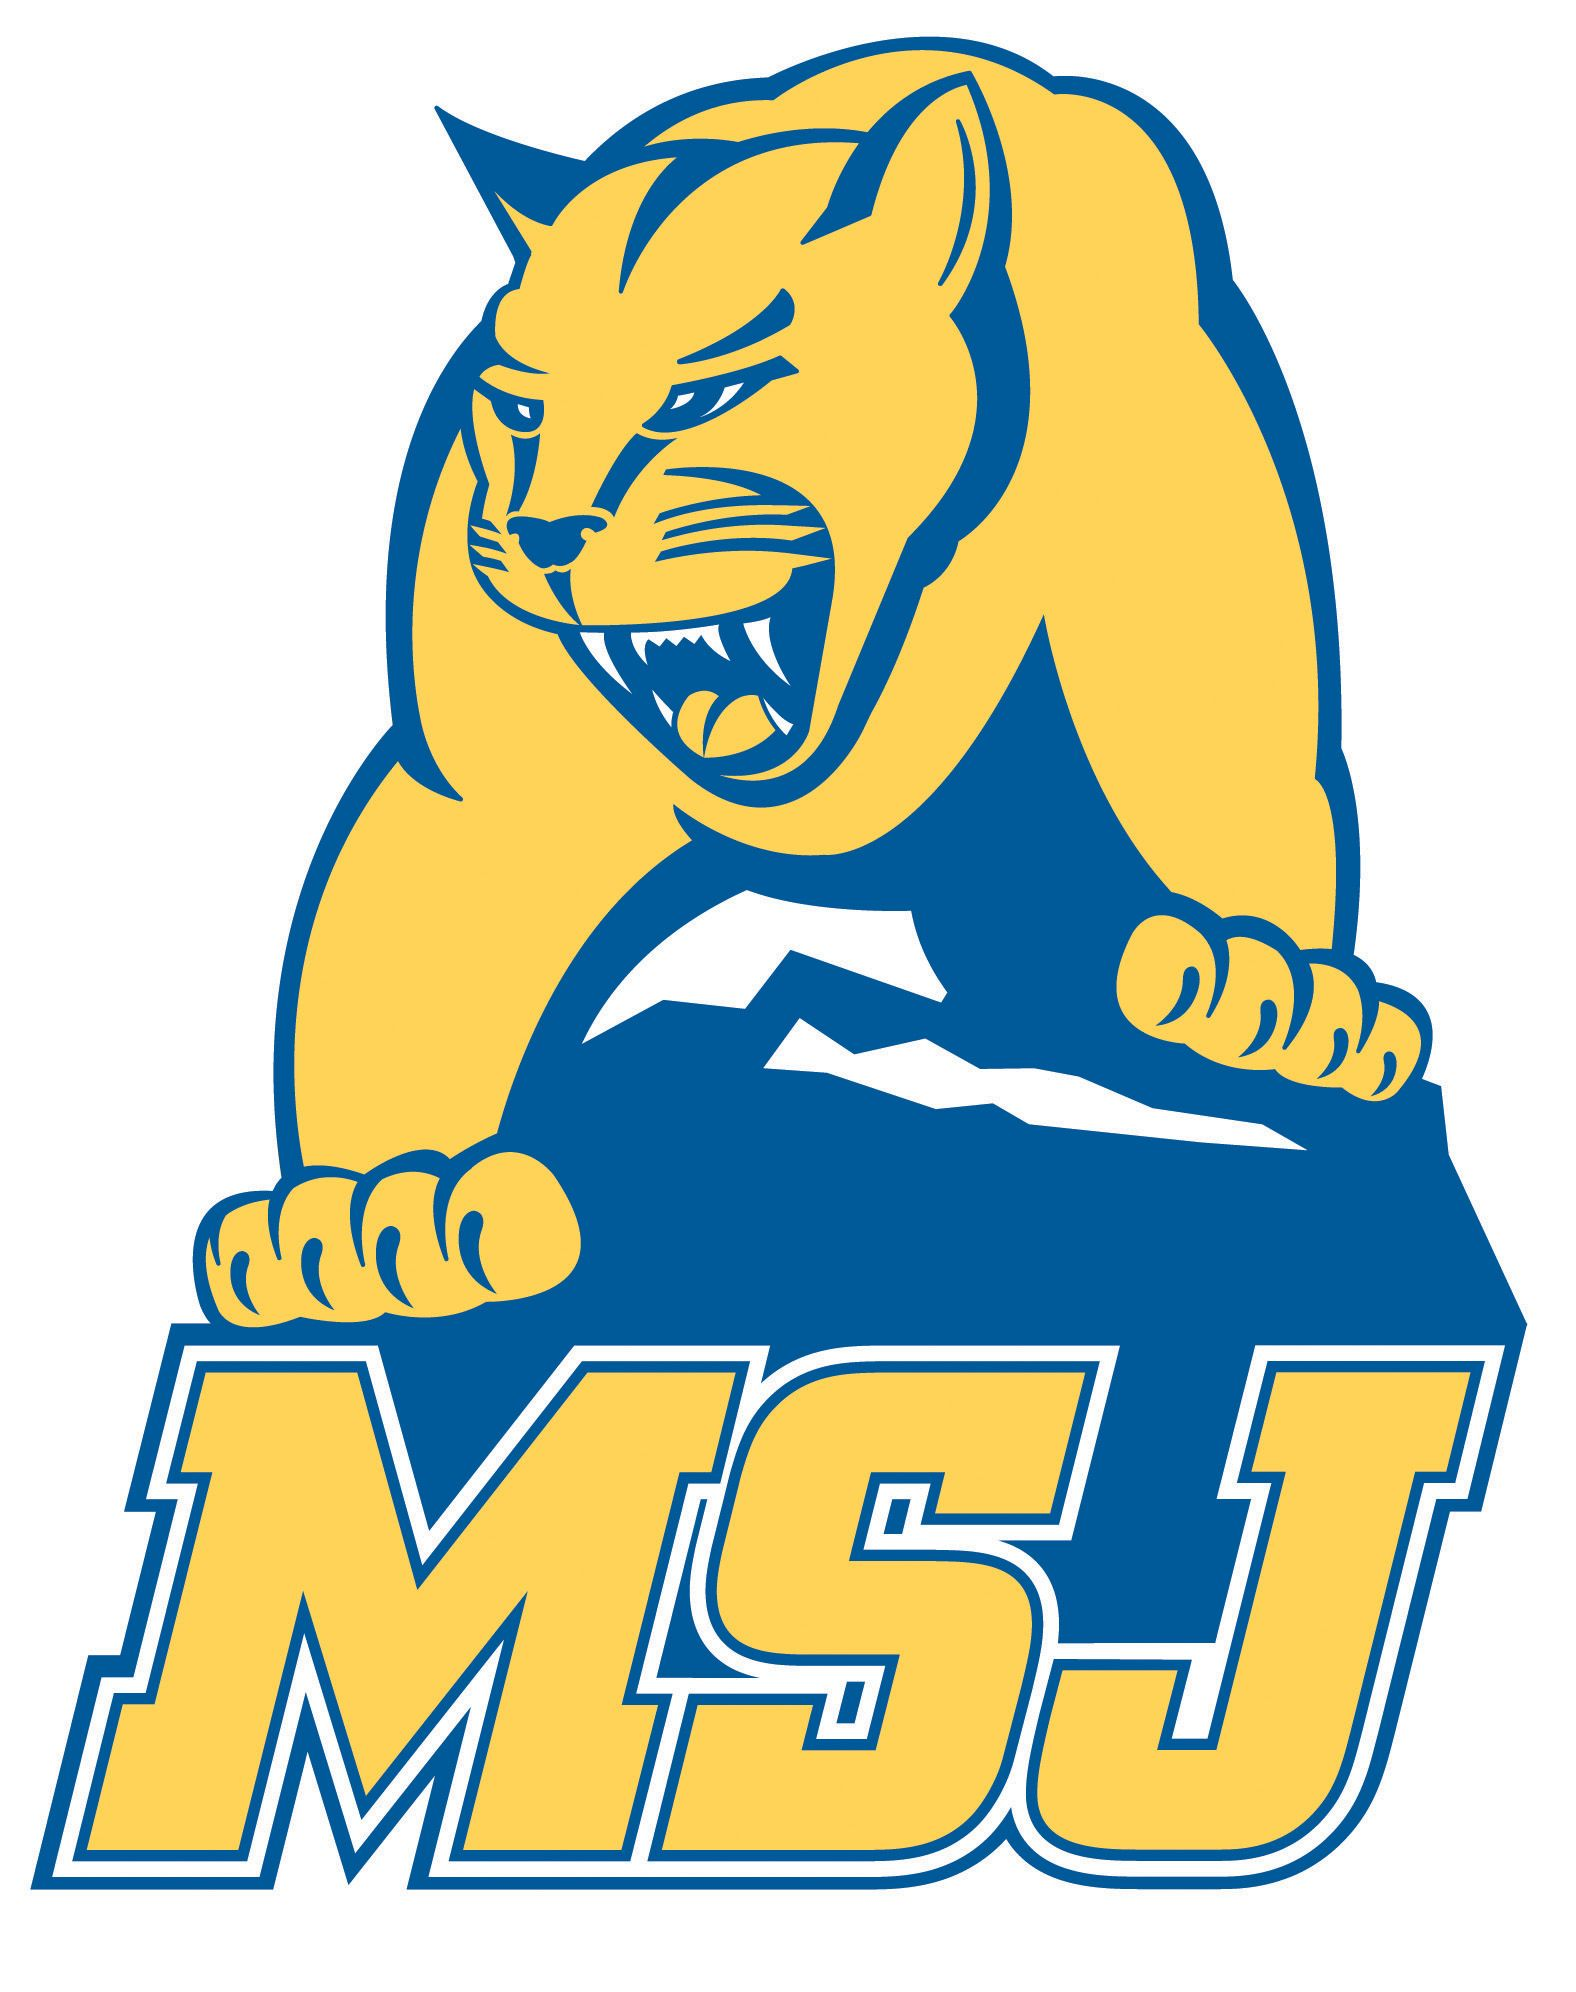 Mount st joseph athletics sports logo university logo